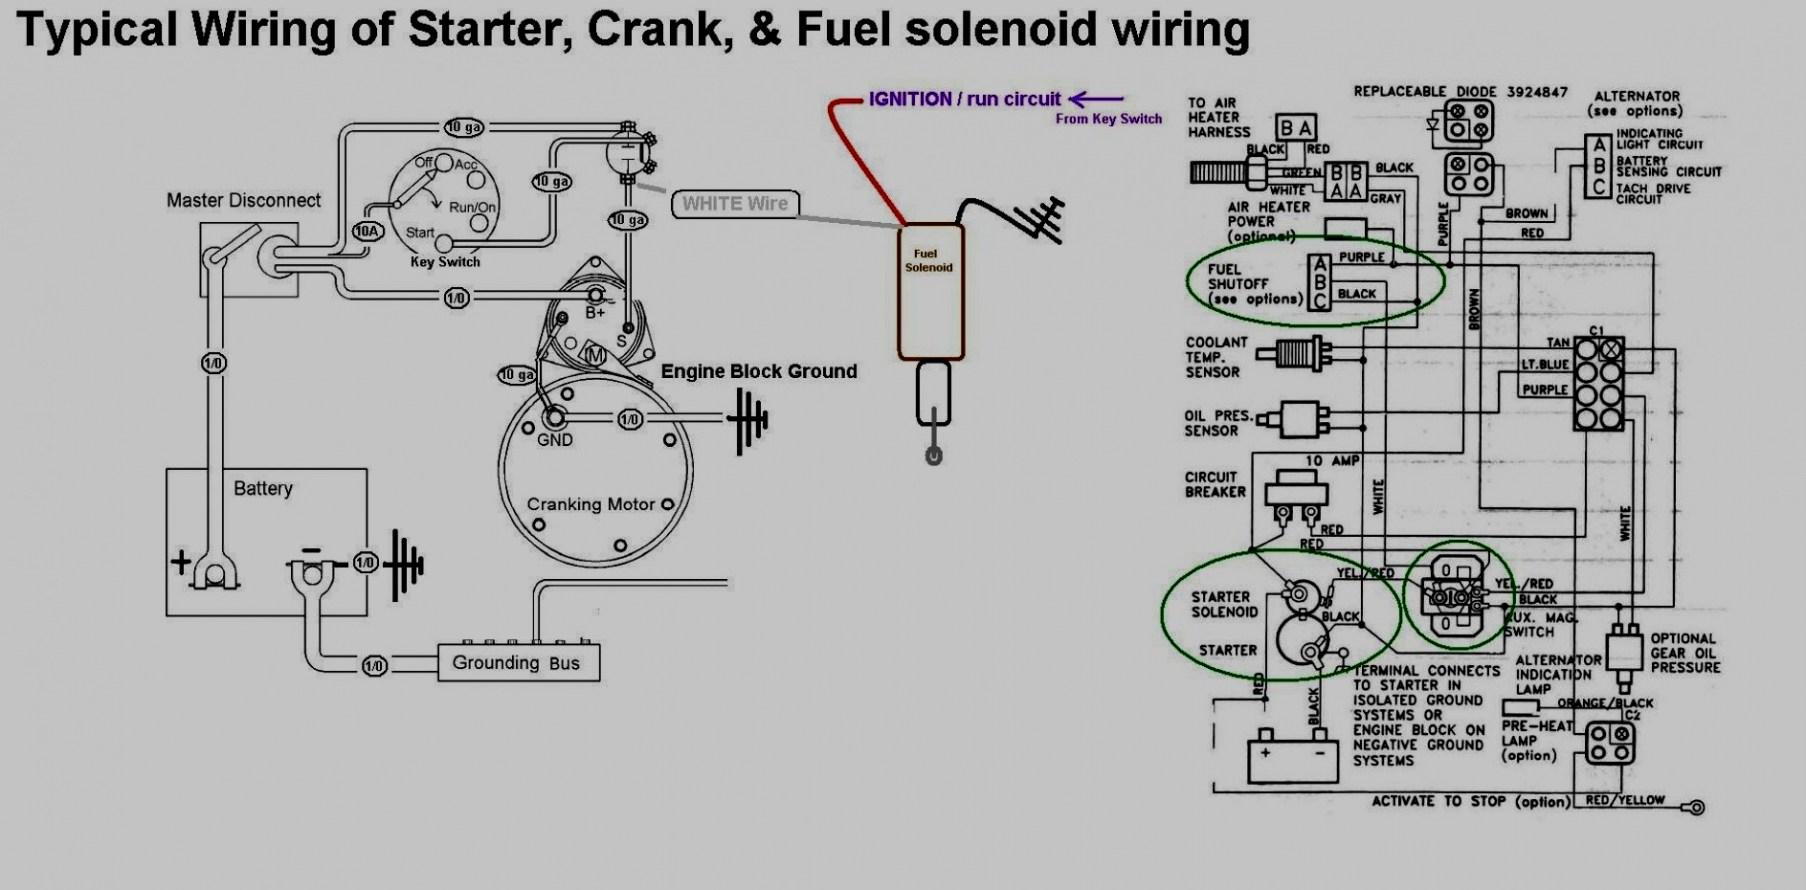 Brilliant 4 Post Continuous Duty Solenoid Wiring Diagram Mtd Fuel House Wiring Cloud Xempagosophoxytasticioscodnessplanboapumohammedshrineorg